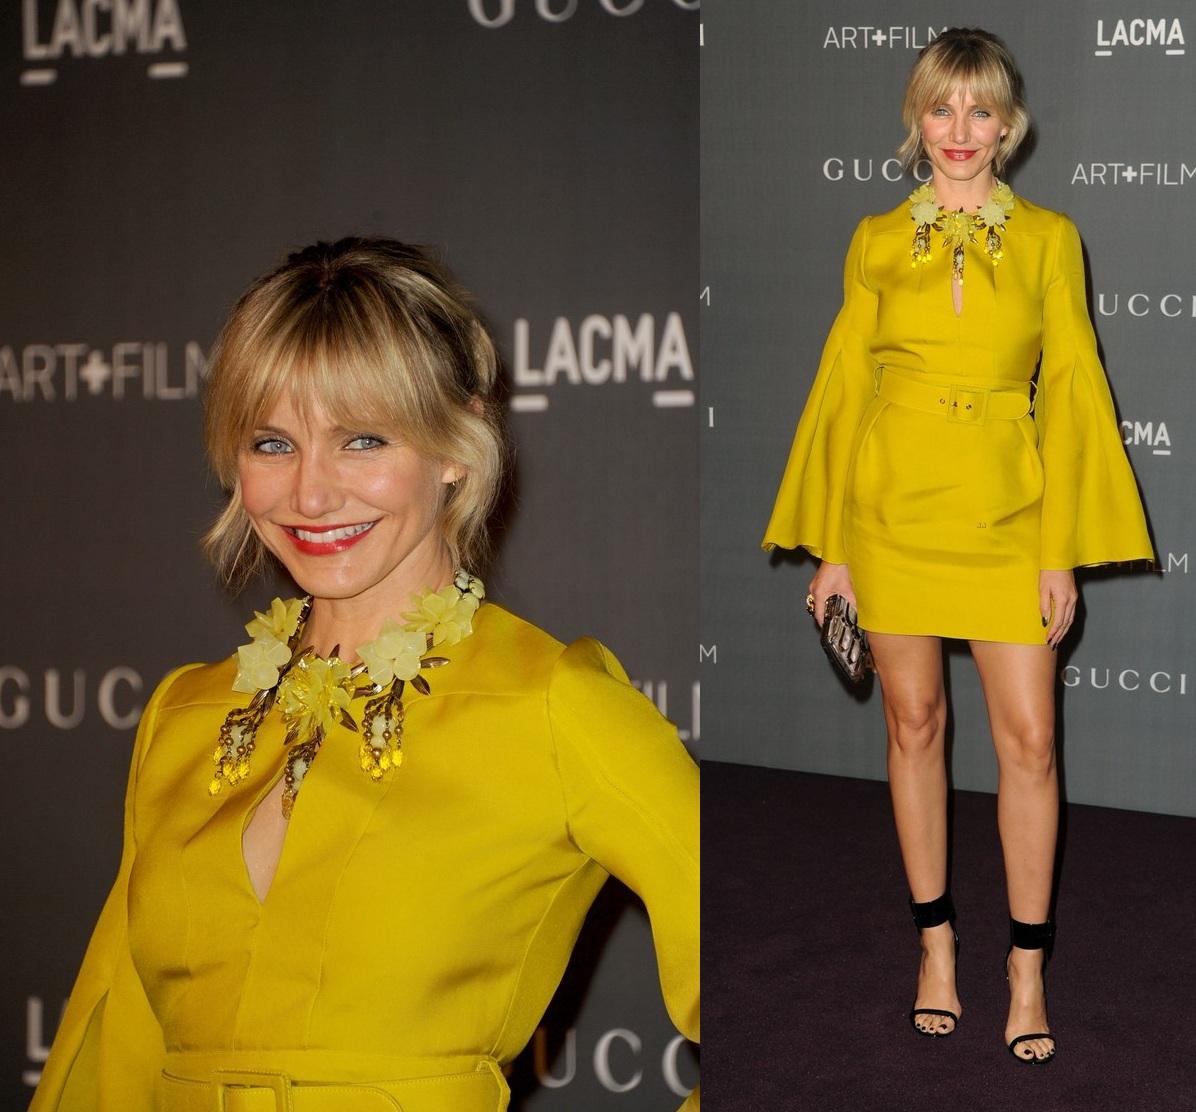 http://3.bp.blogspot.com/-FiYrUhVsuhE/UI2ryqEIukI/AAAAAAAAO2Q/PbP2SS4r7M4/s1600/cameron+diaz+gucci+spring+2013+lacma+gala+hollywood+yellow+hair.jpg